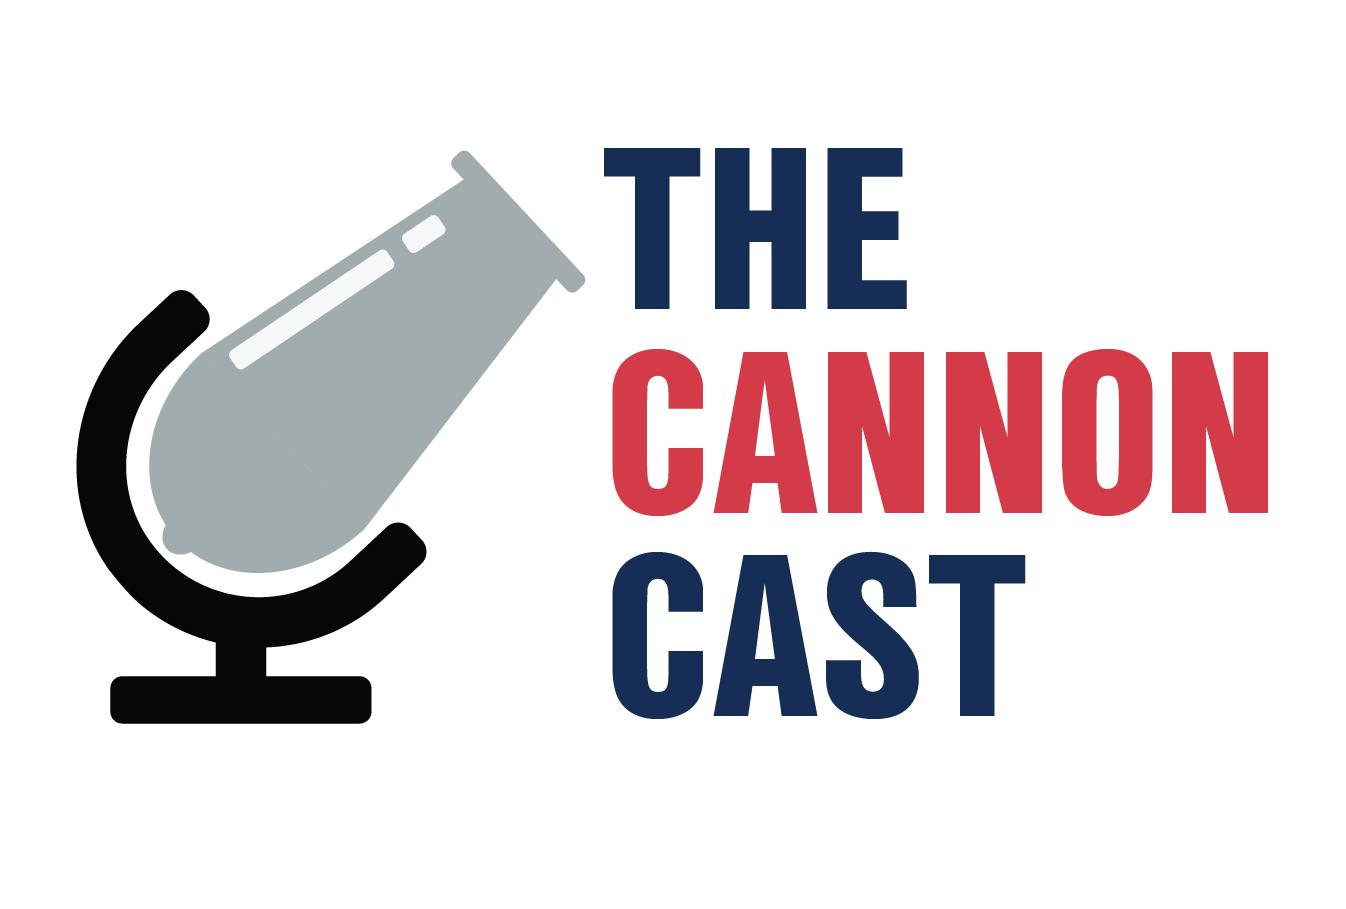 The Cannon Cast logo